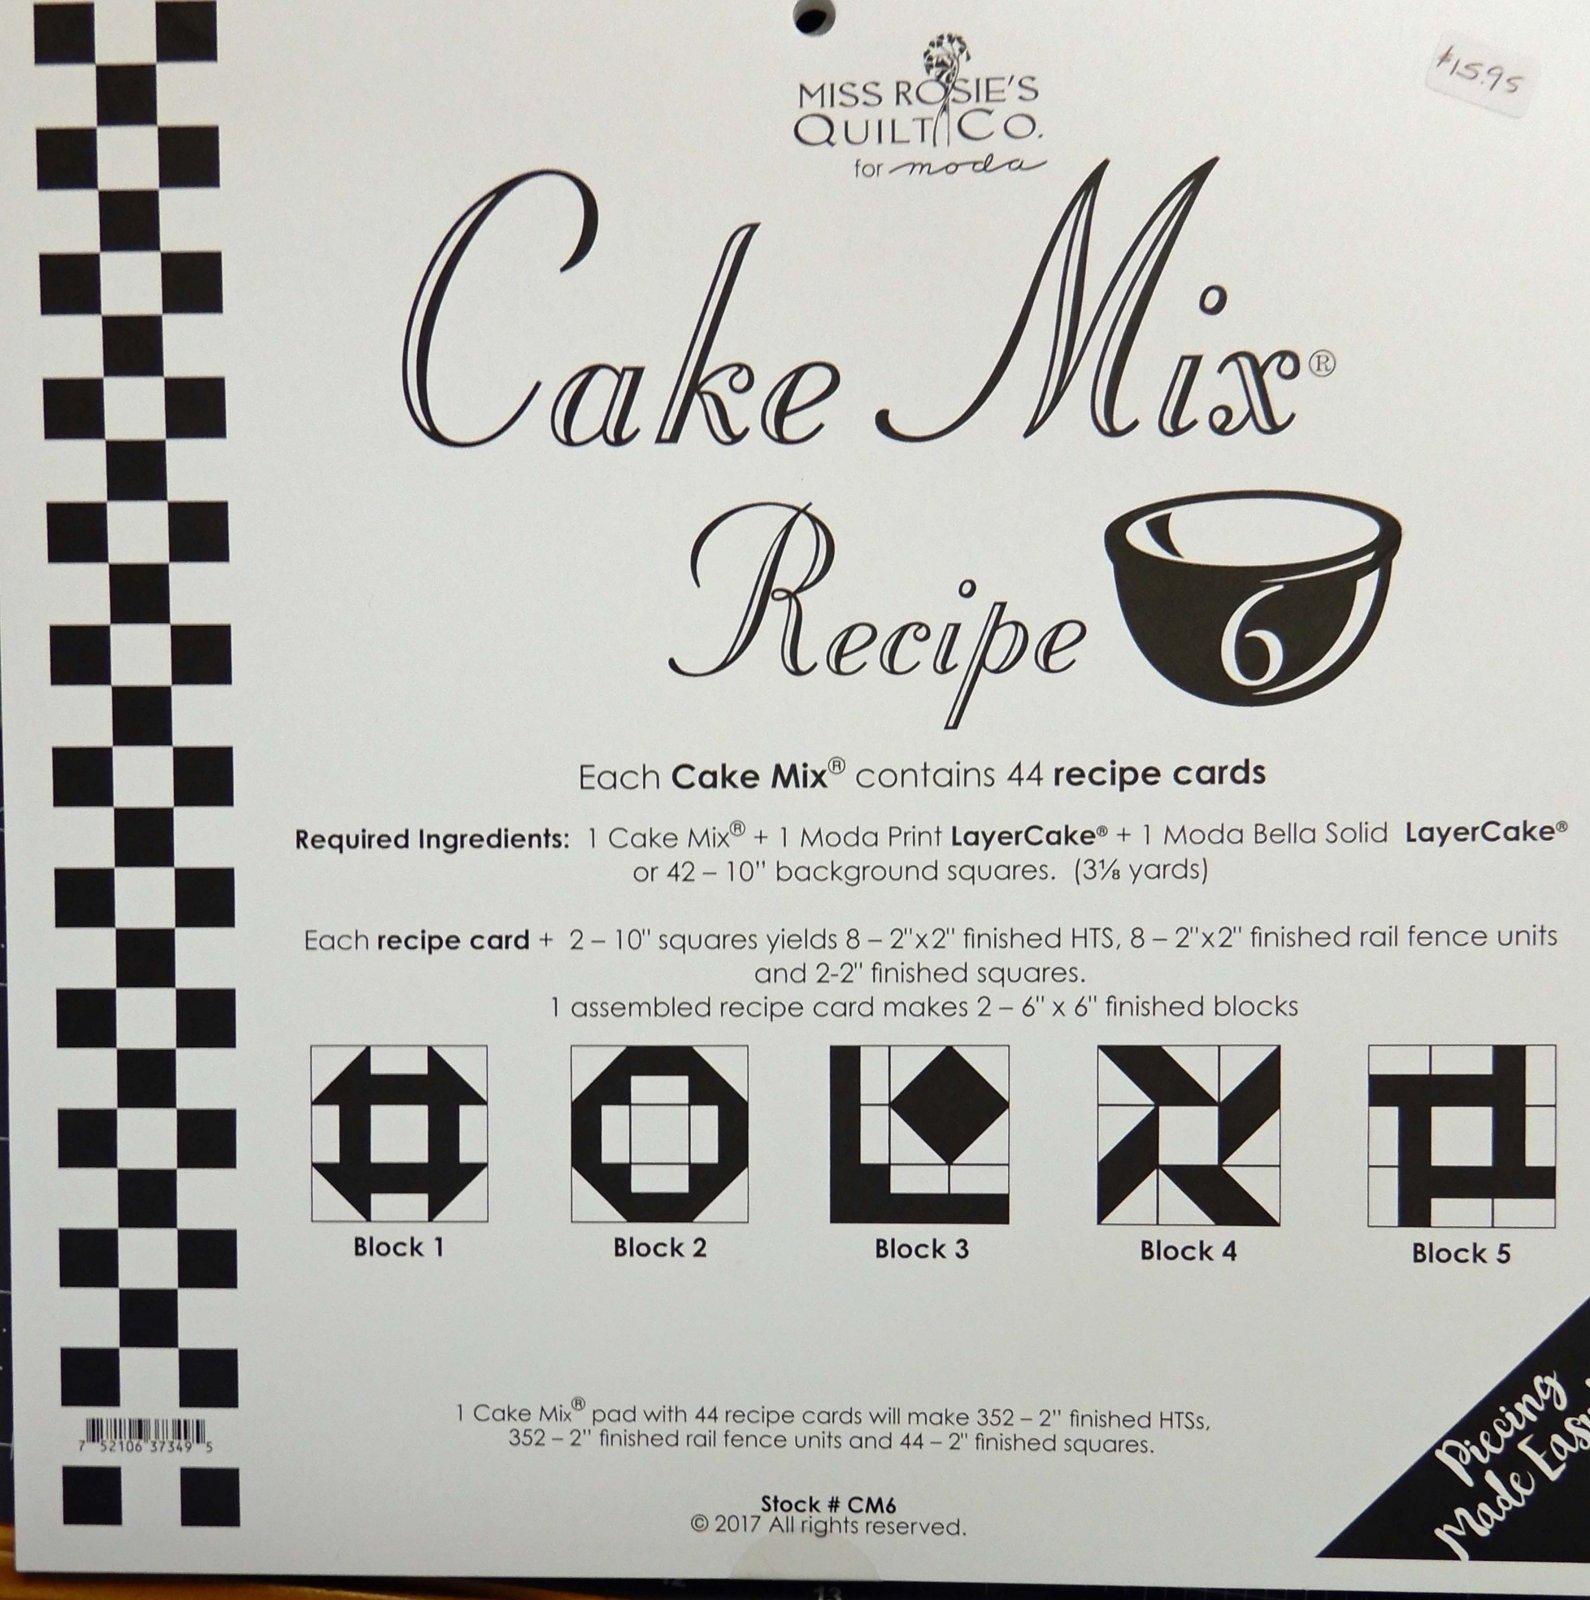 Cake Mix Recipe volume 6